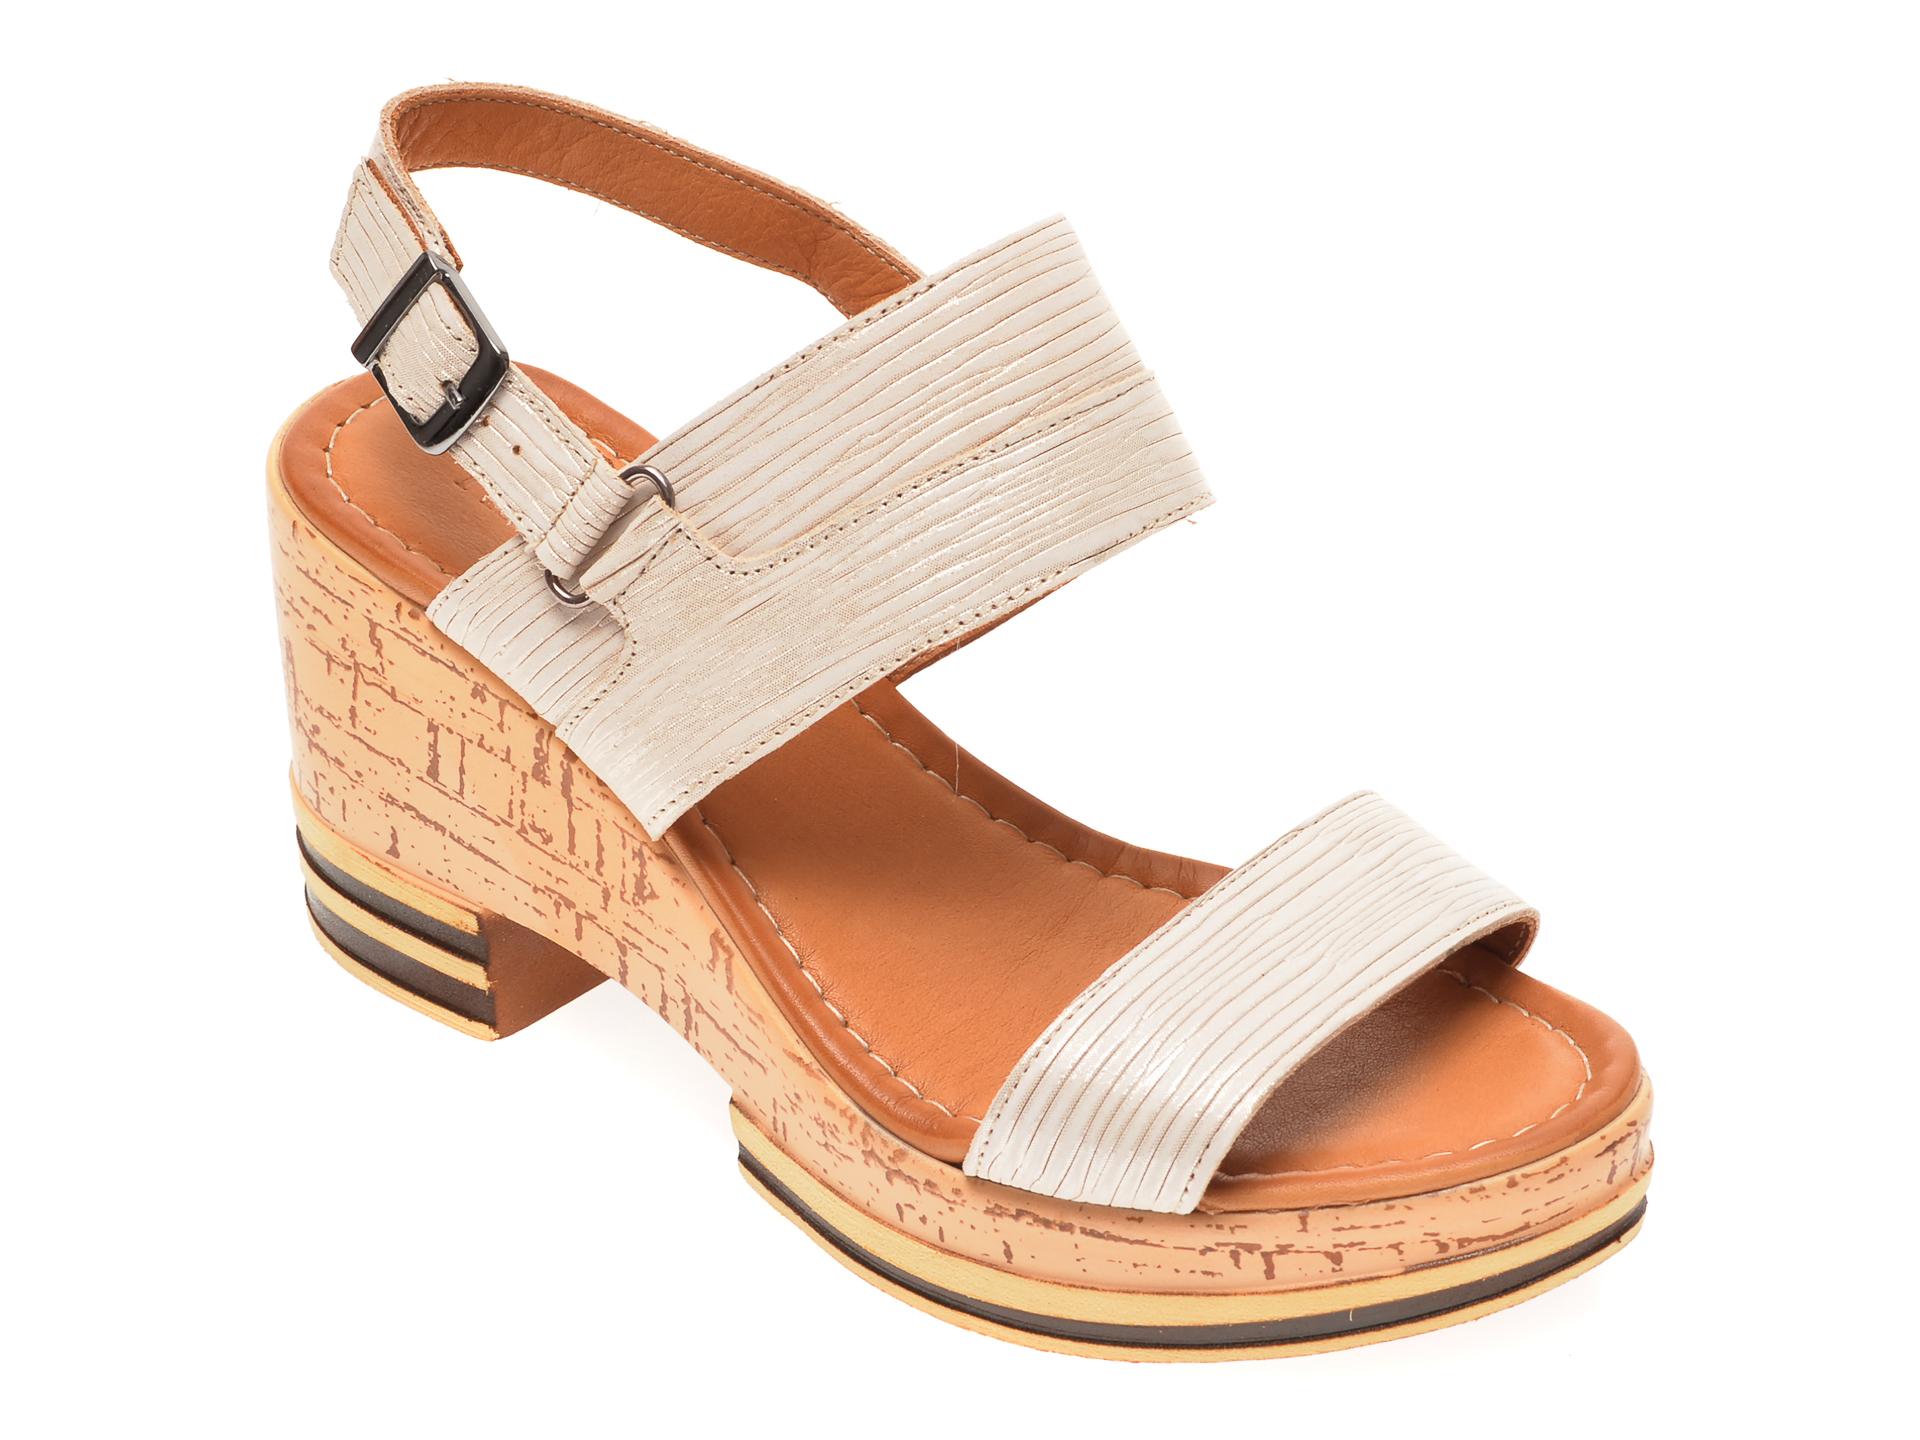 Sandale FLAVIA PASSINI bej, 1182731, din piele naturala